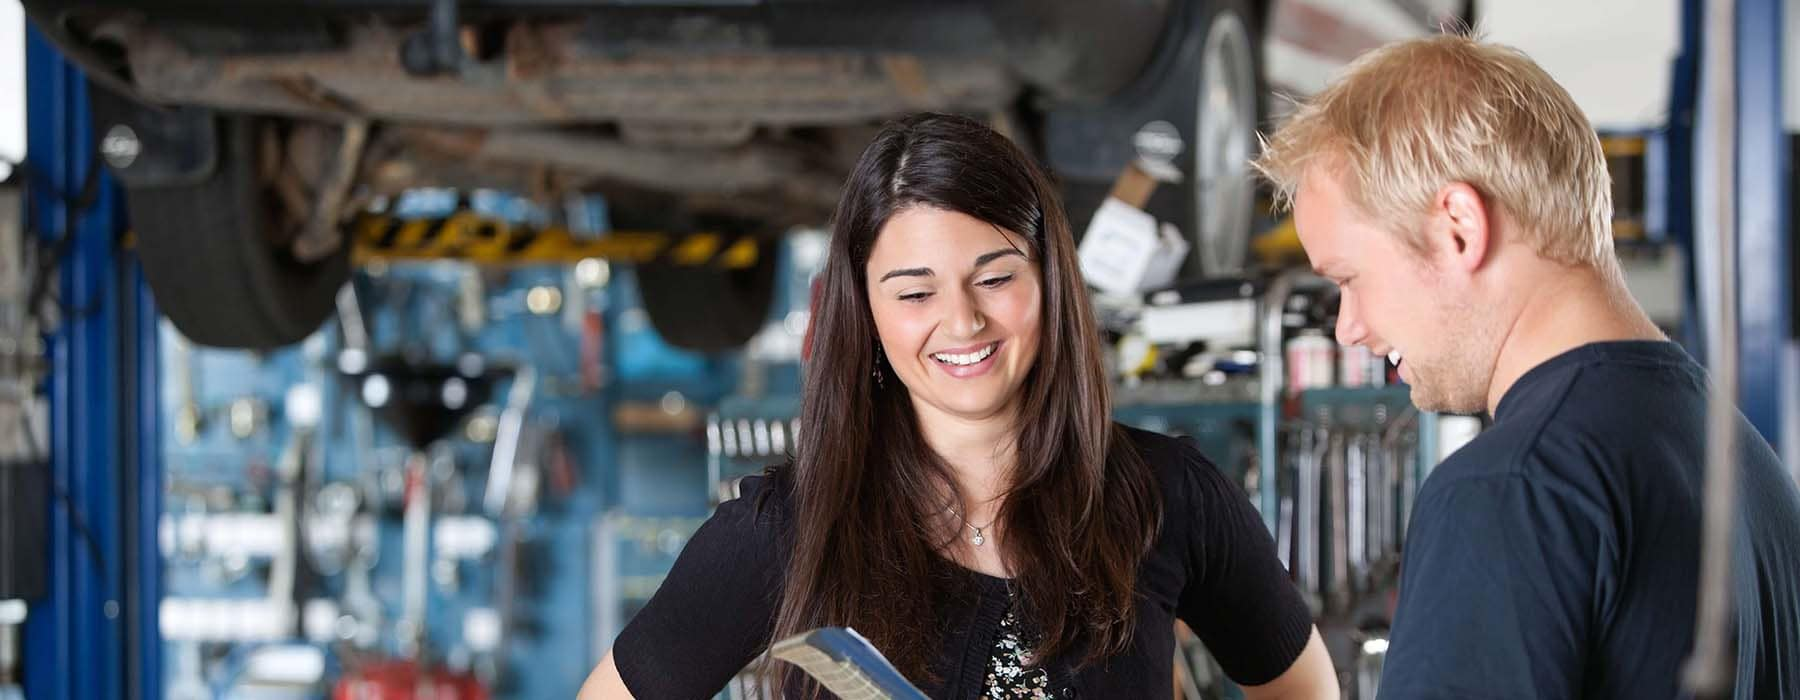 Mechanic Talking to Woman